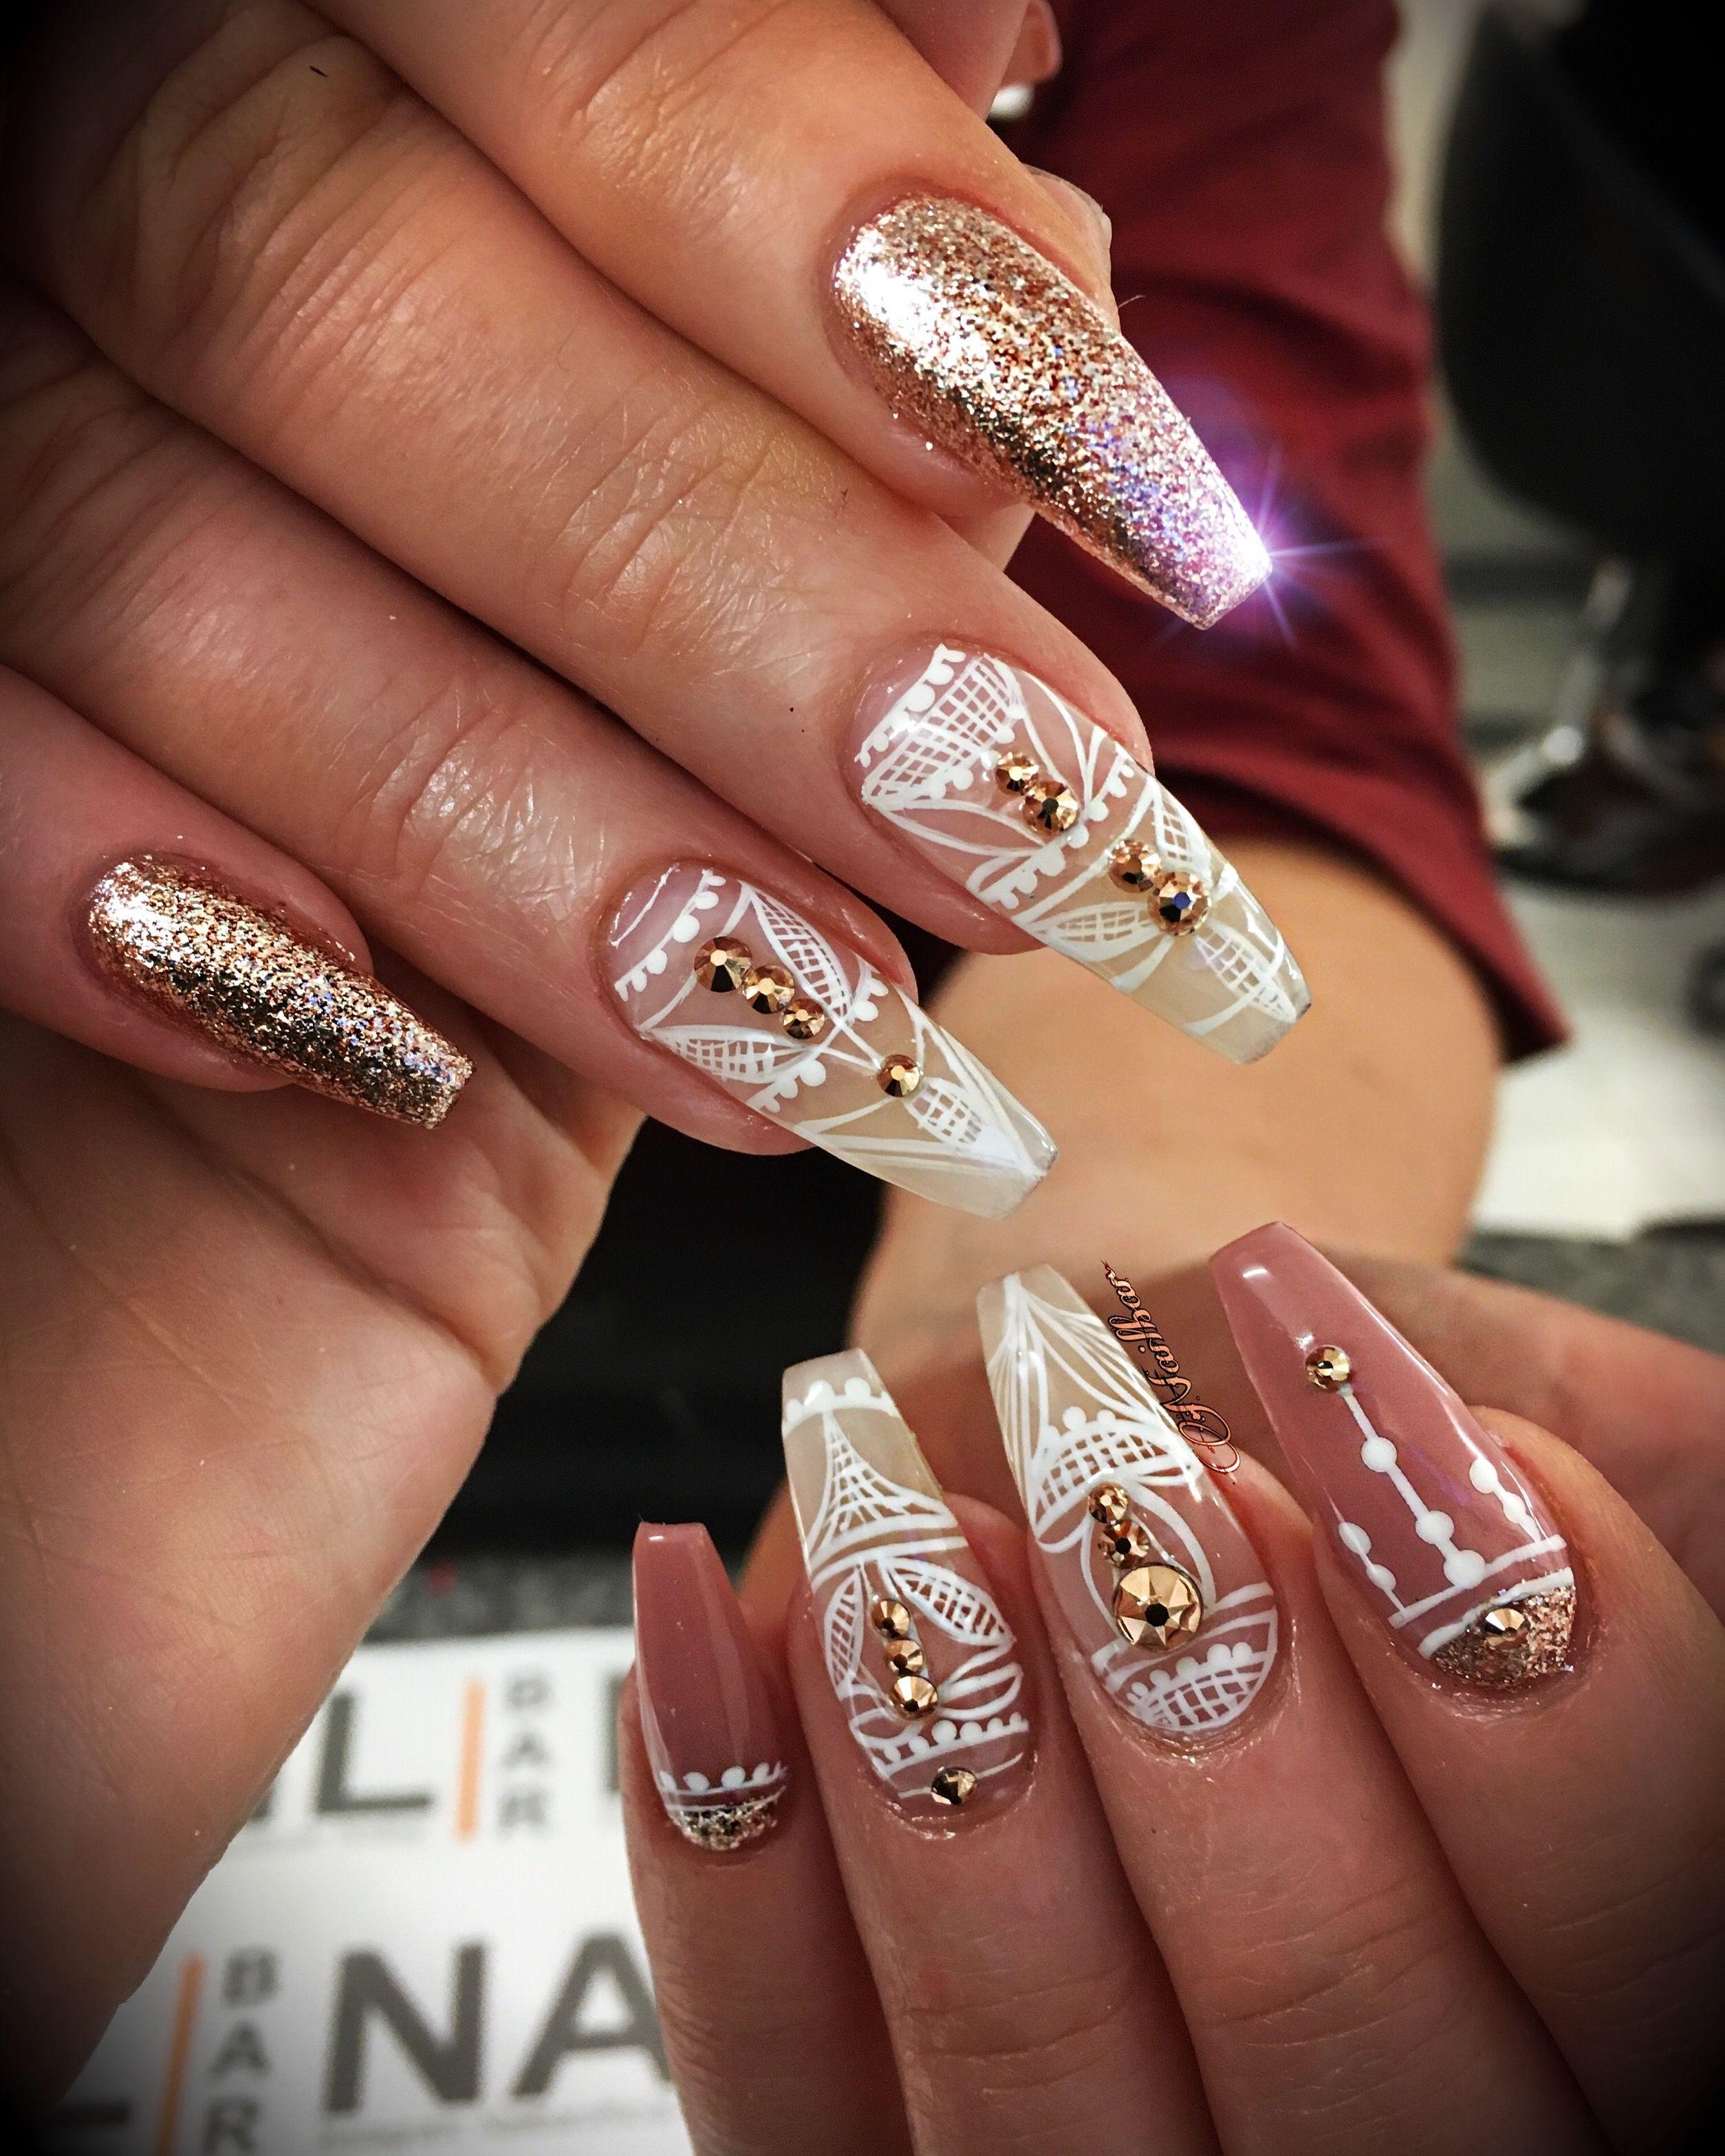 Pin de Laura Villanueva en nails | Pinterest | Diseños de uñas, Hola ...